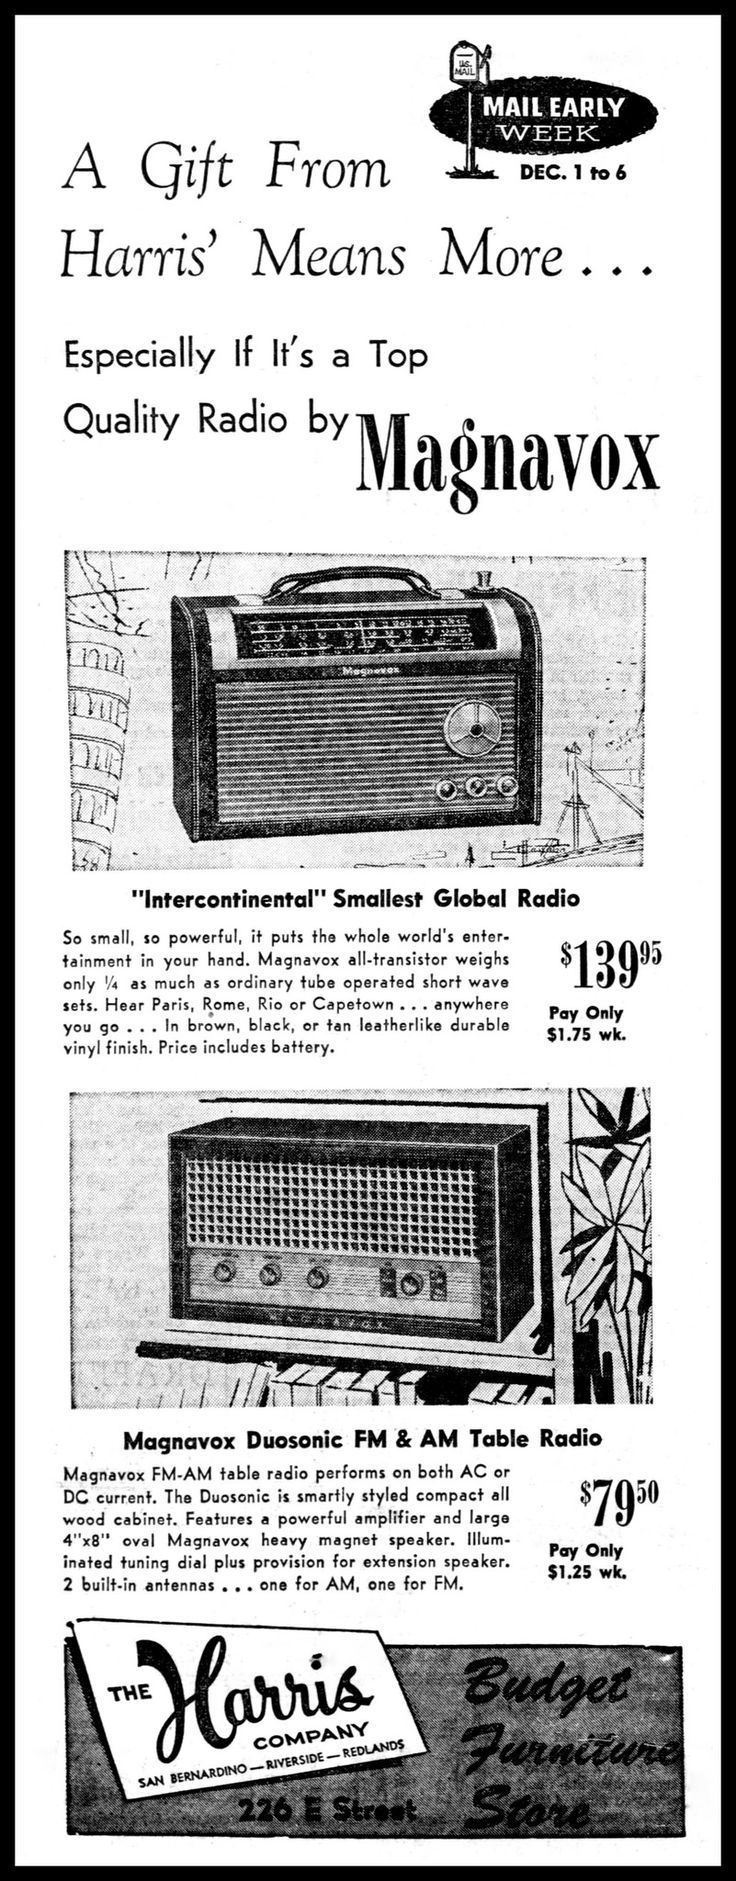 https://flic.kr/p/YwN18f | Advertising For The Magnavox Model FM18 Table Radio In The San Bernardino County California Sun Newspaper, December 4, 1958